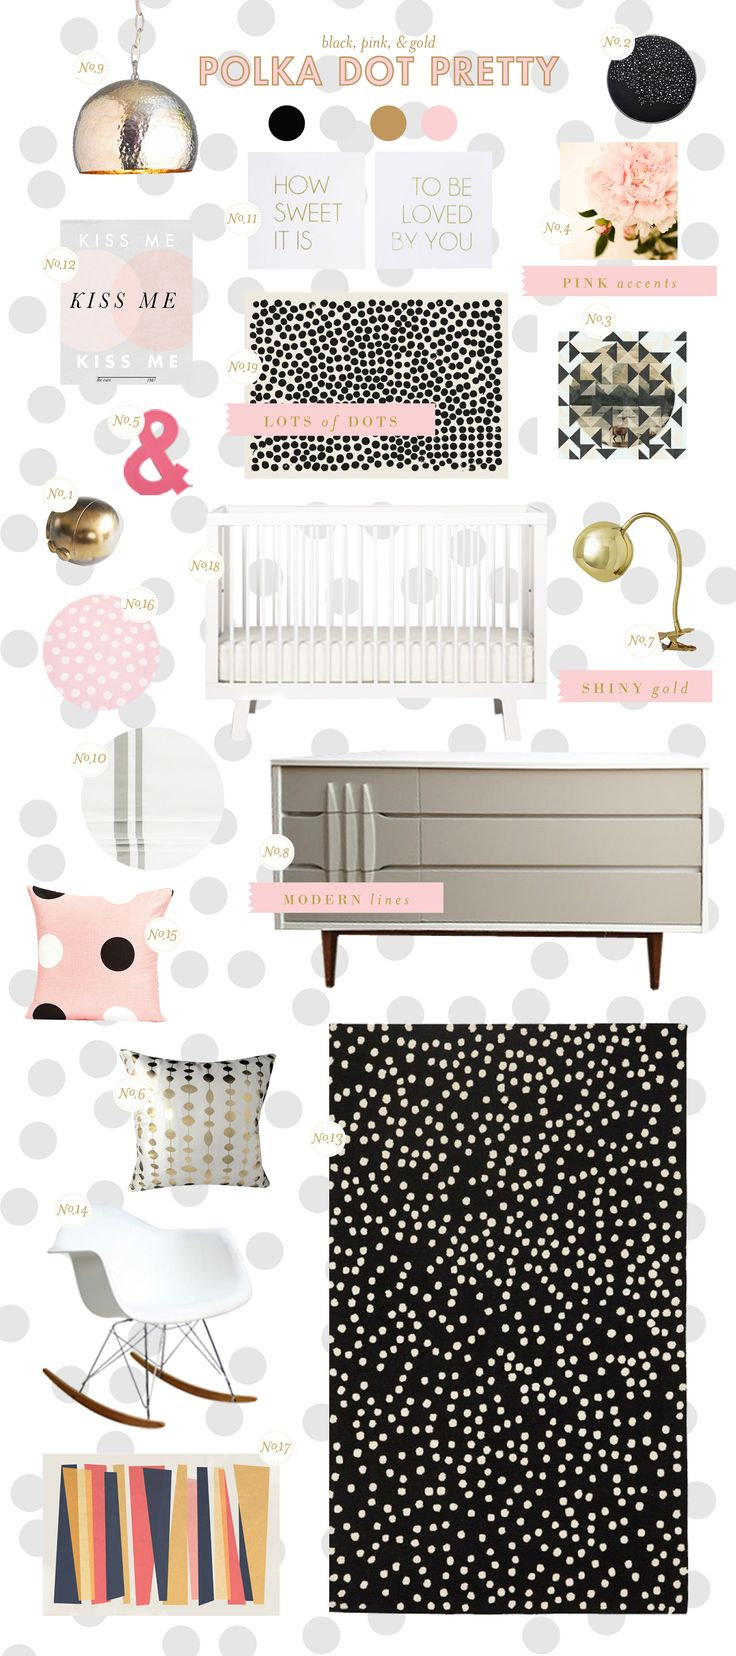 polka dot baby nursery inspiration style board by laybabylay